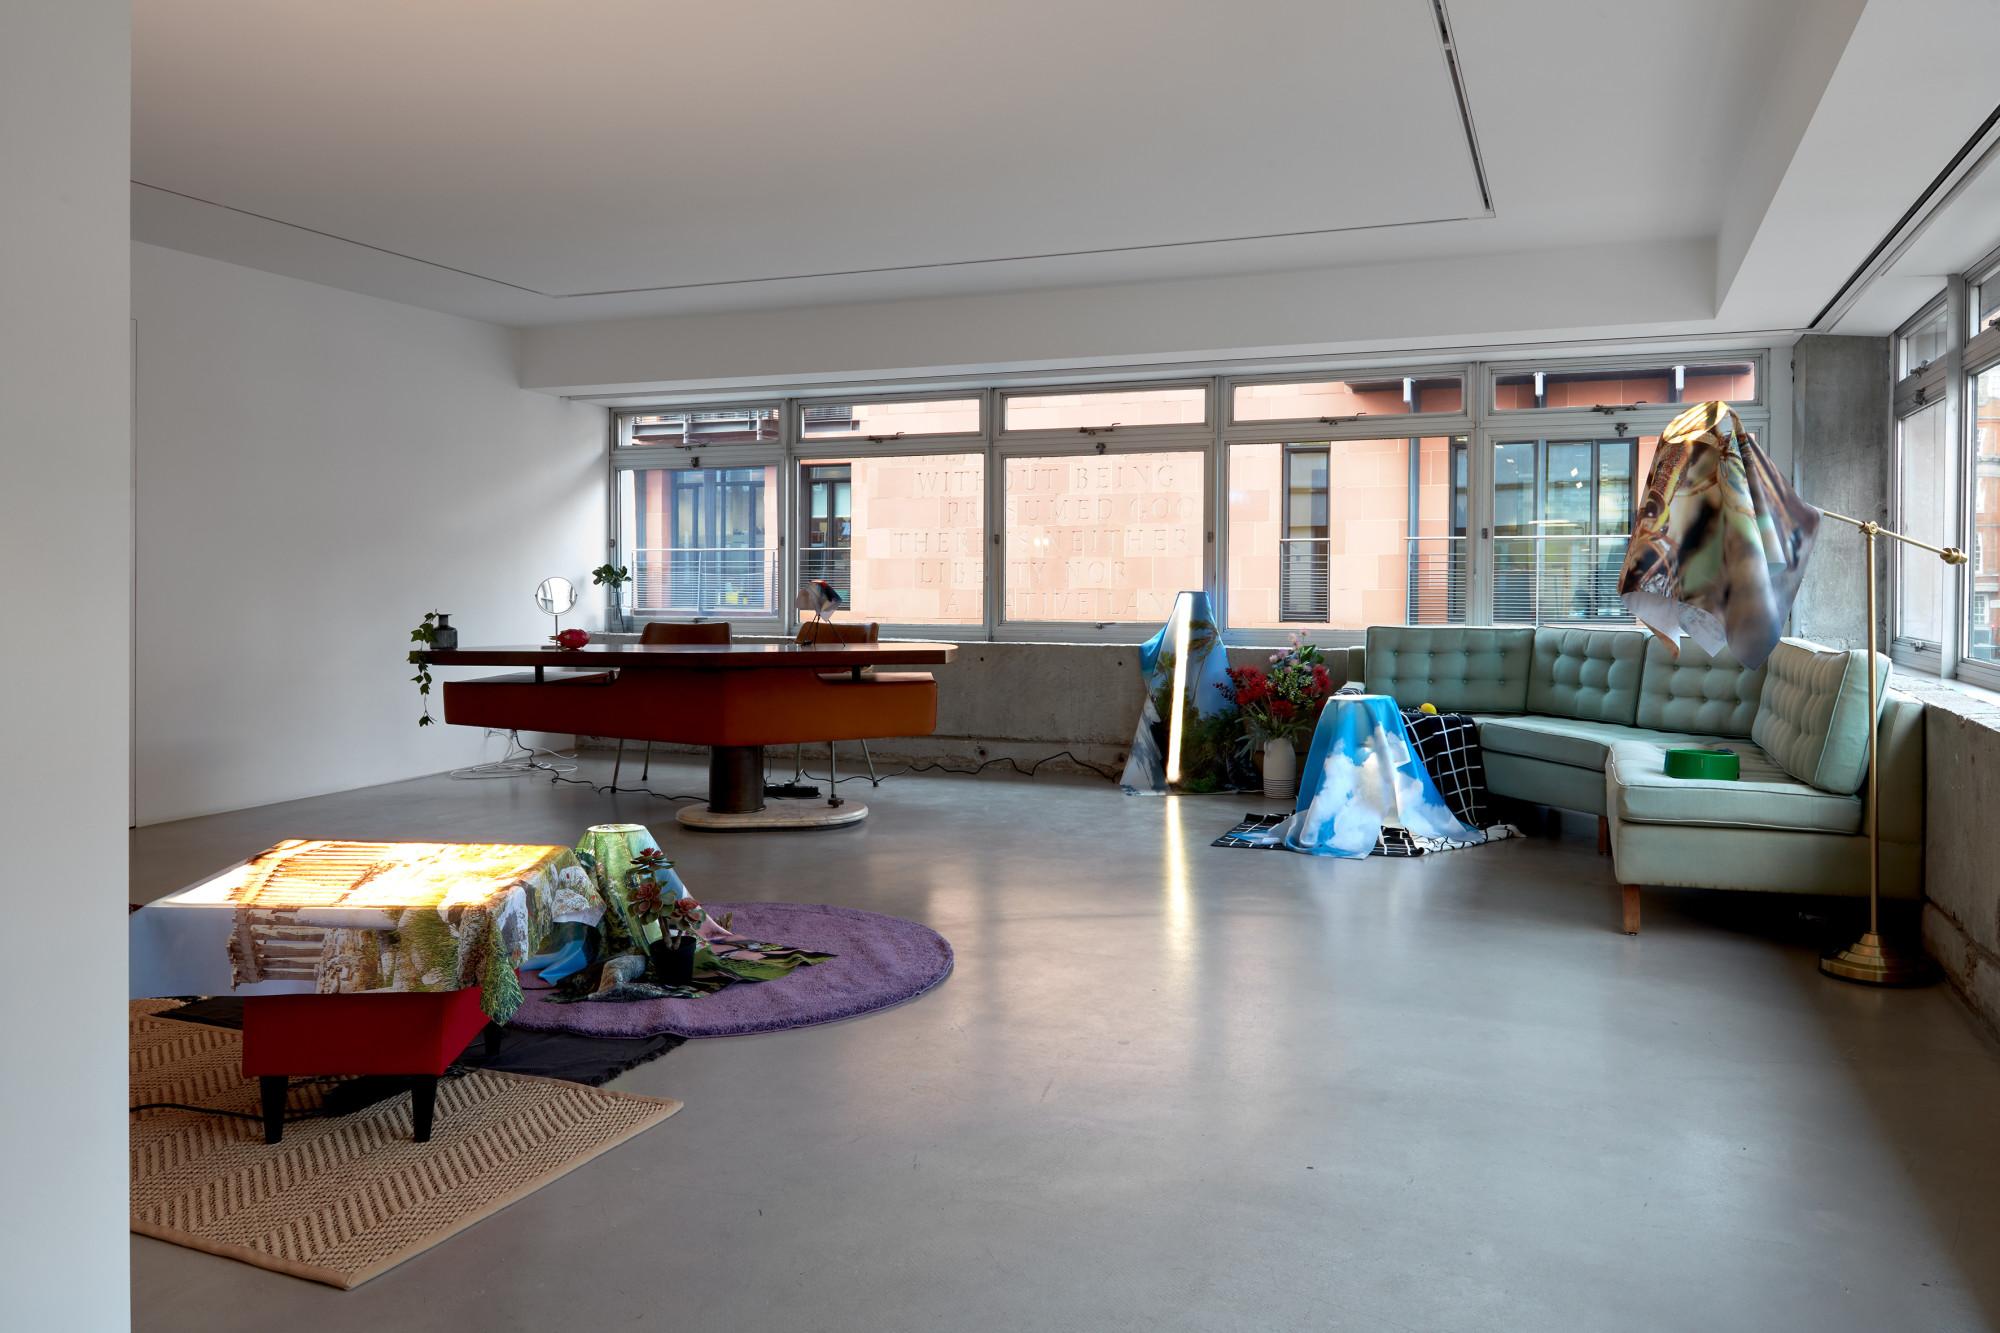 <p>Installation view, Edouard Malingue, Nabuqi, 1 Davies Street, 2020</p><p>Photo by Robert Glowacki</p>